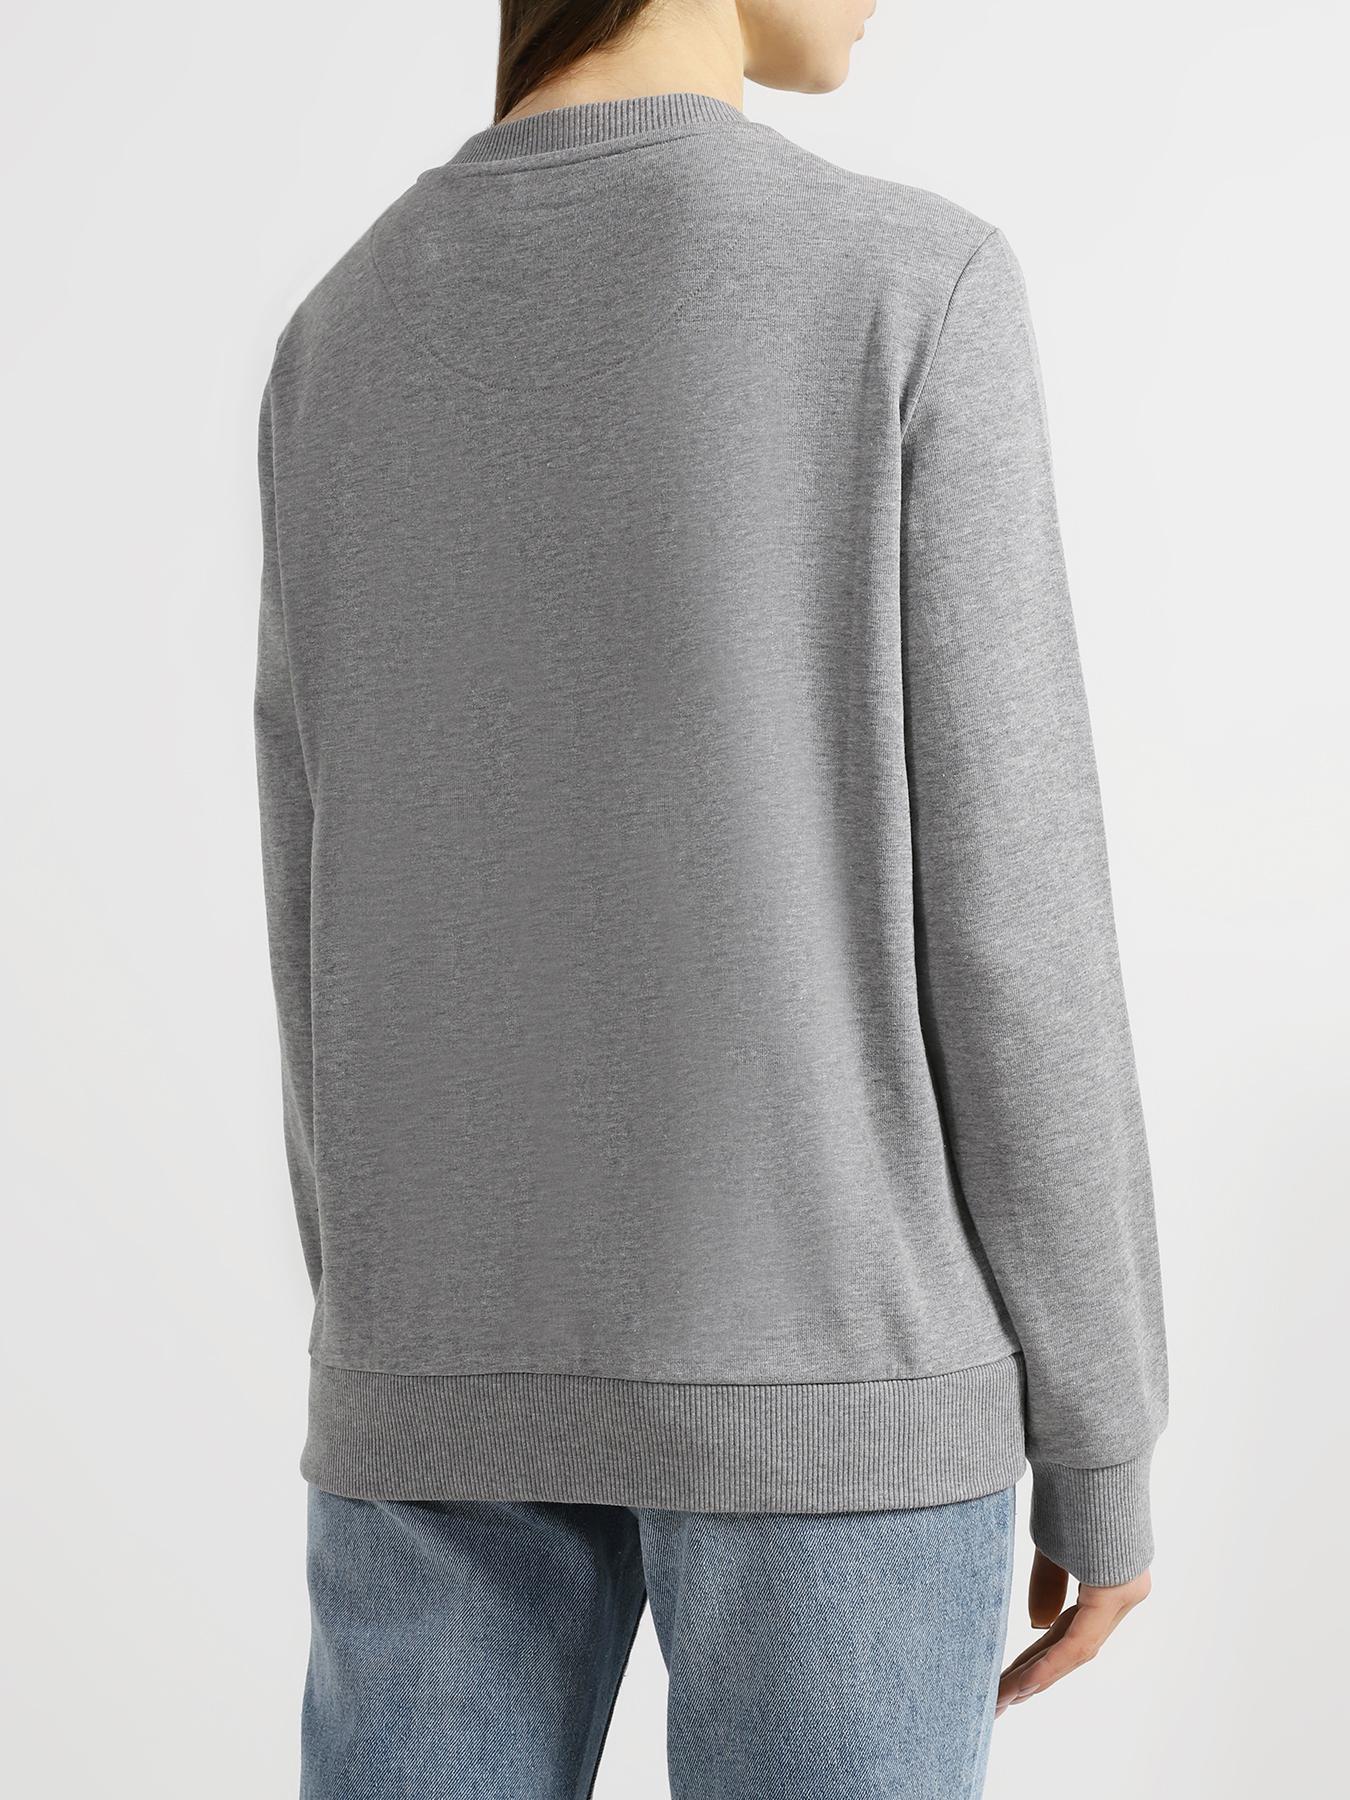 Versace Jeans Couture Женский джемпер 346090-043 Фото 2